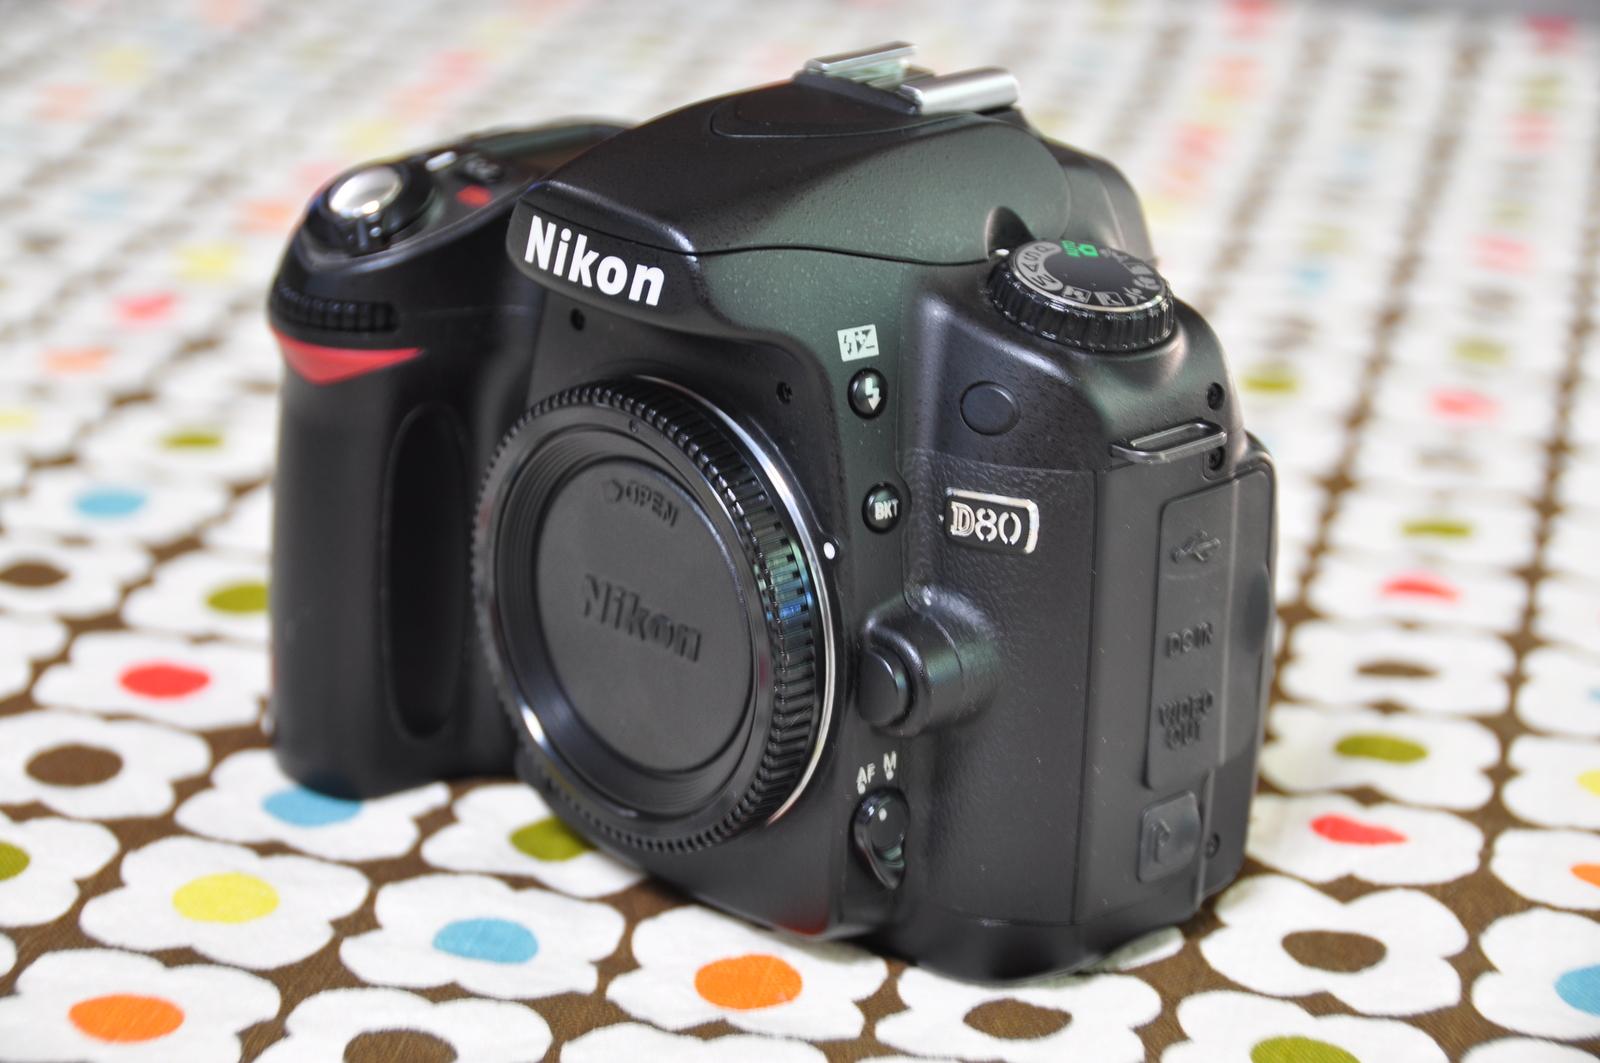 Nikon d80.stock